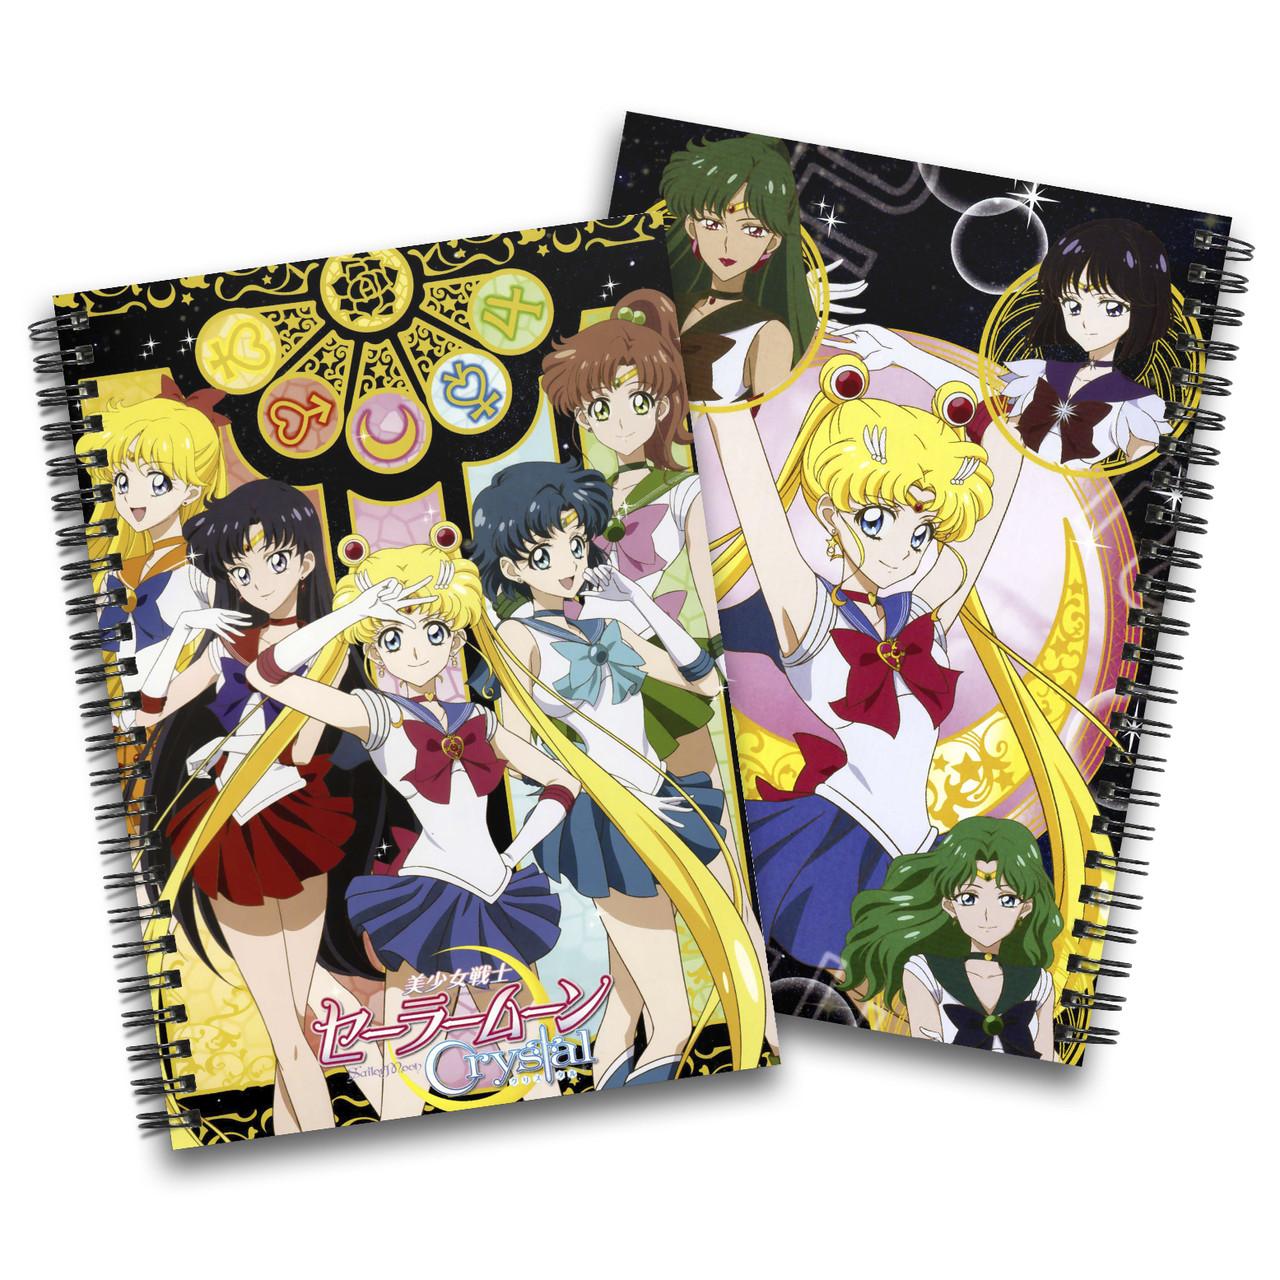 Скетчбук Красавица-воин Сейлор Мун | Sailor Moon 06